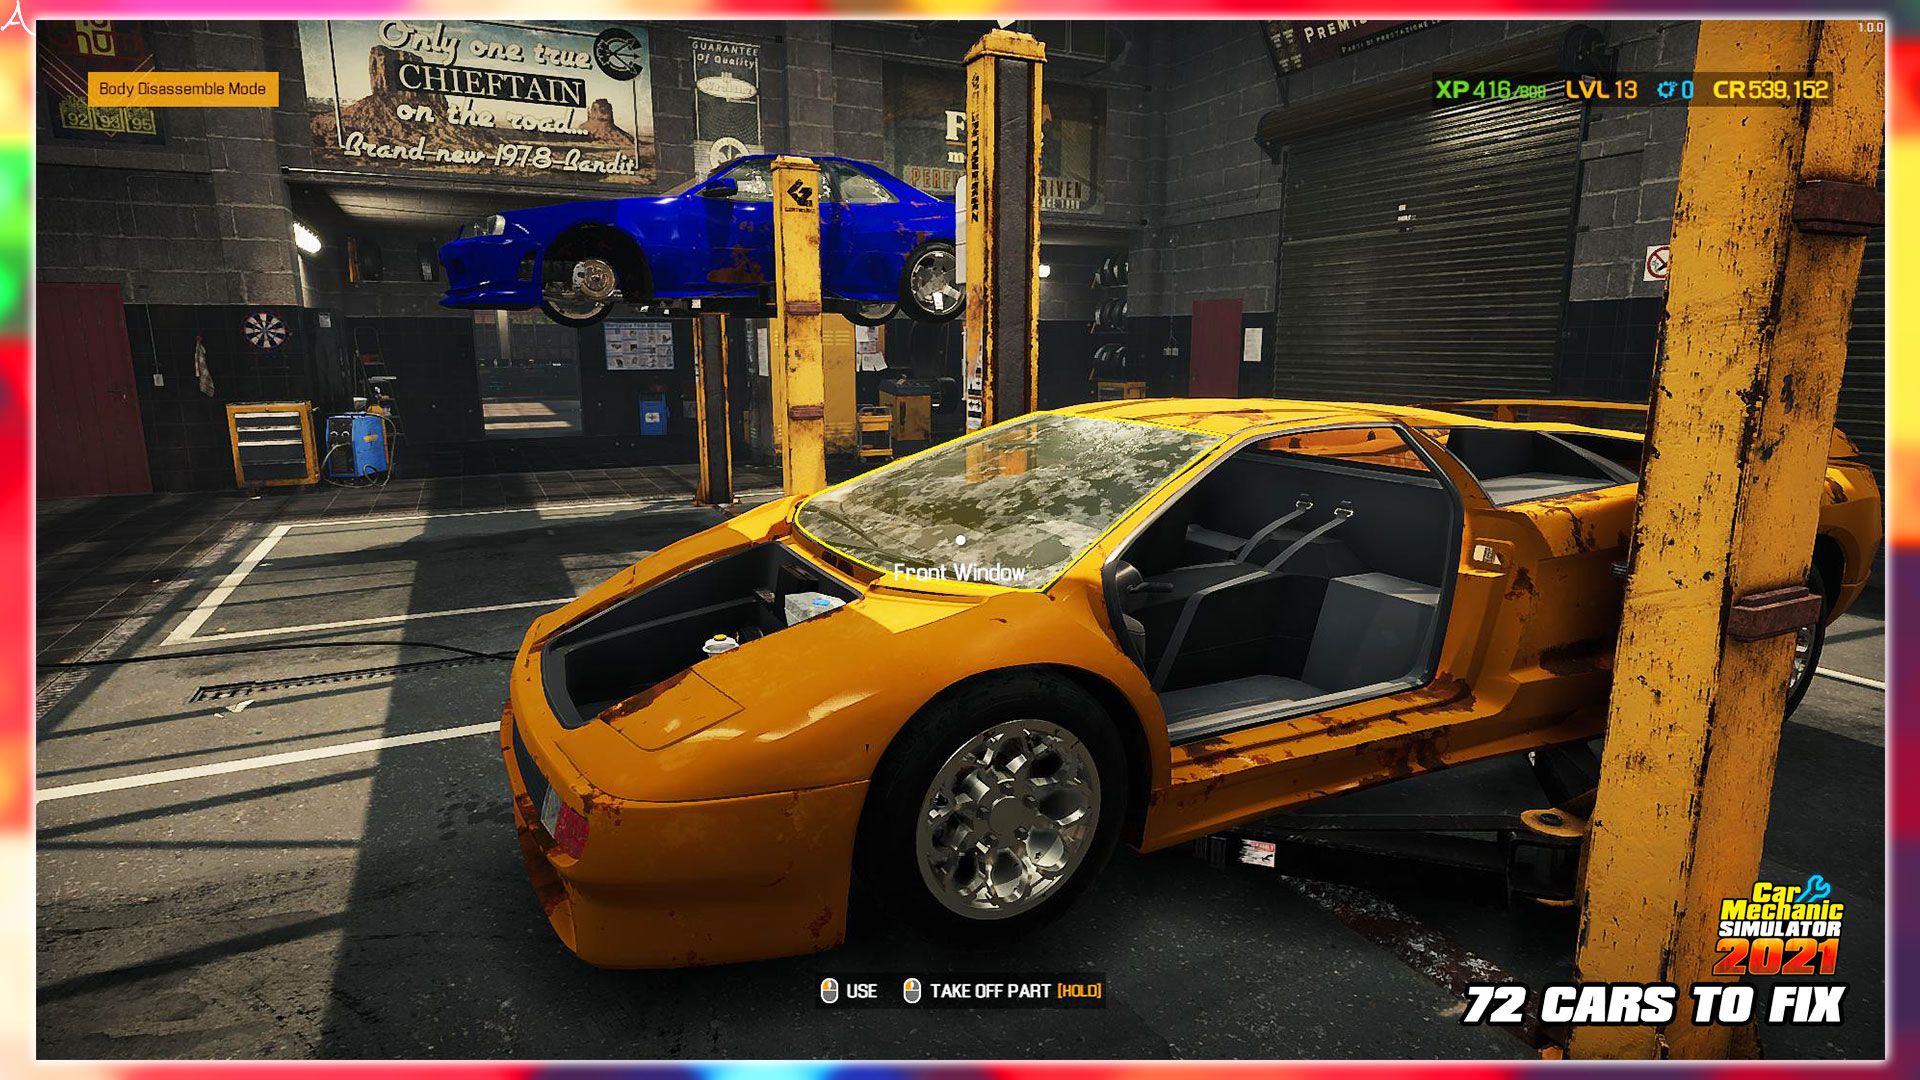 PC版「Car Mechanic Simulator 2021」に必要な最低/推奨スペックを確認